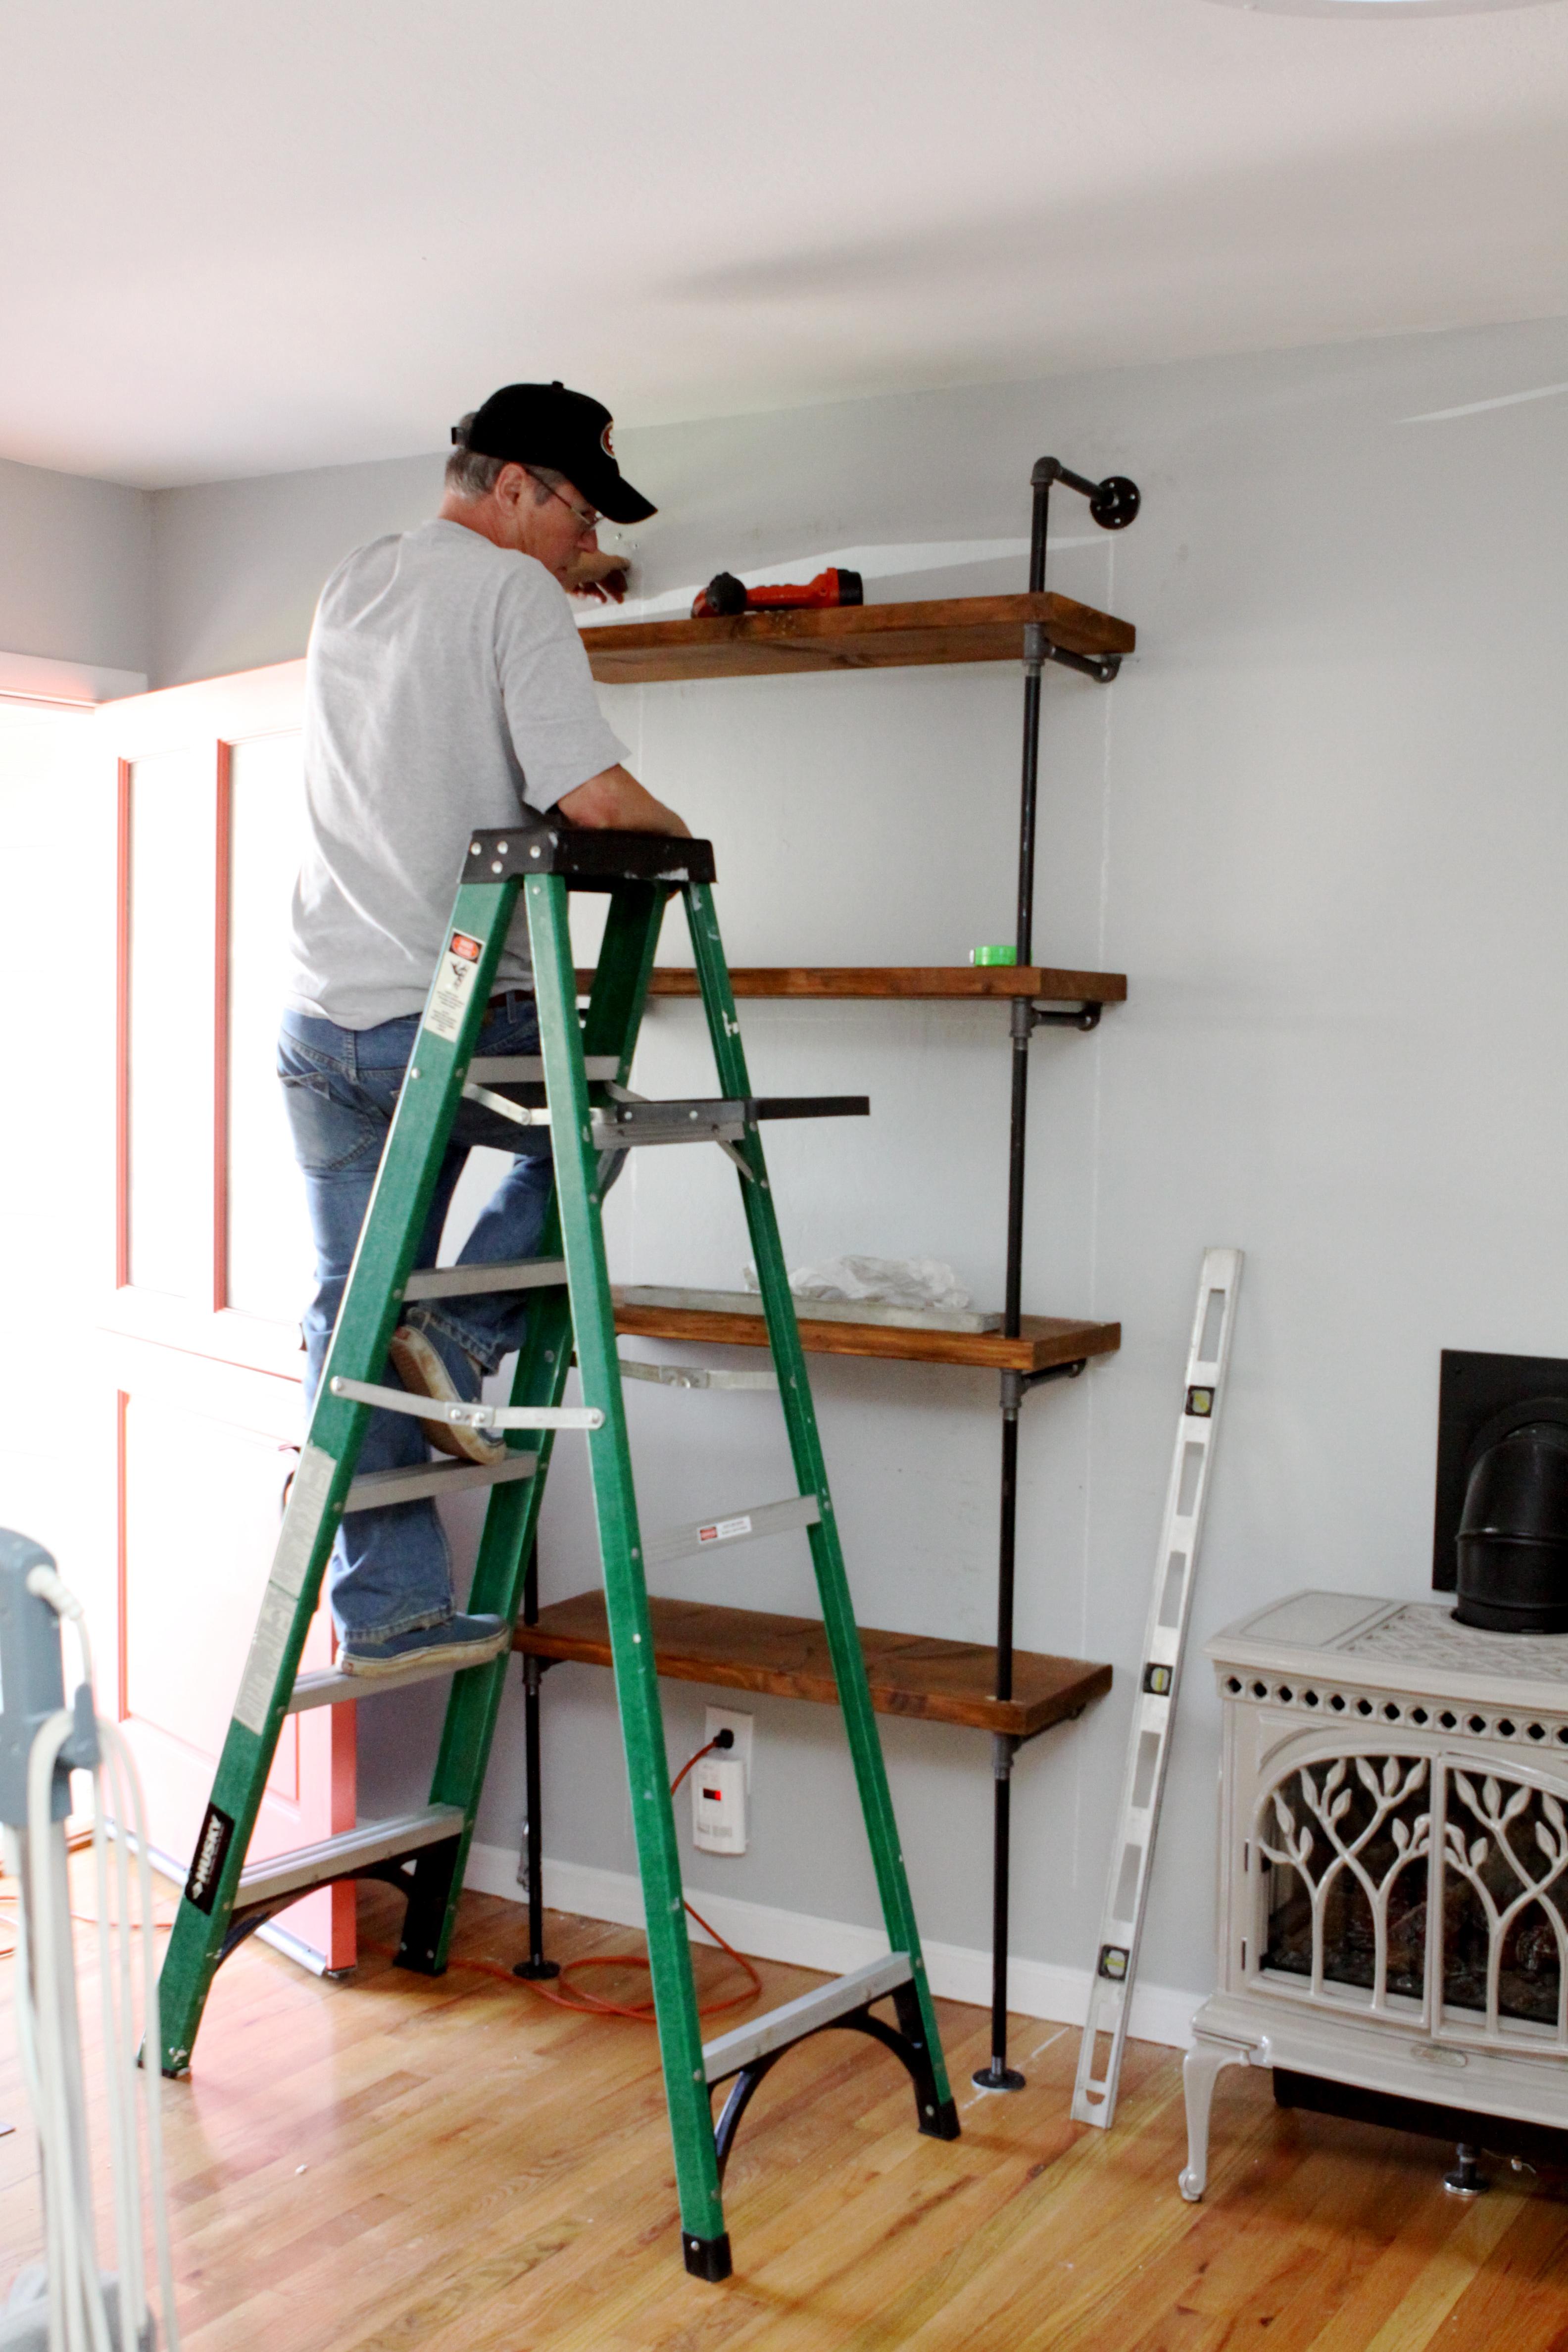 Diy rad bookshelves holla pomp and circumstance for How to diy bookshelf